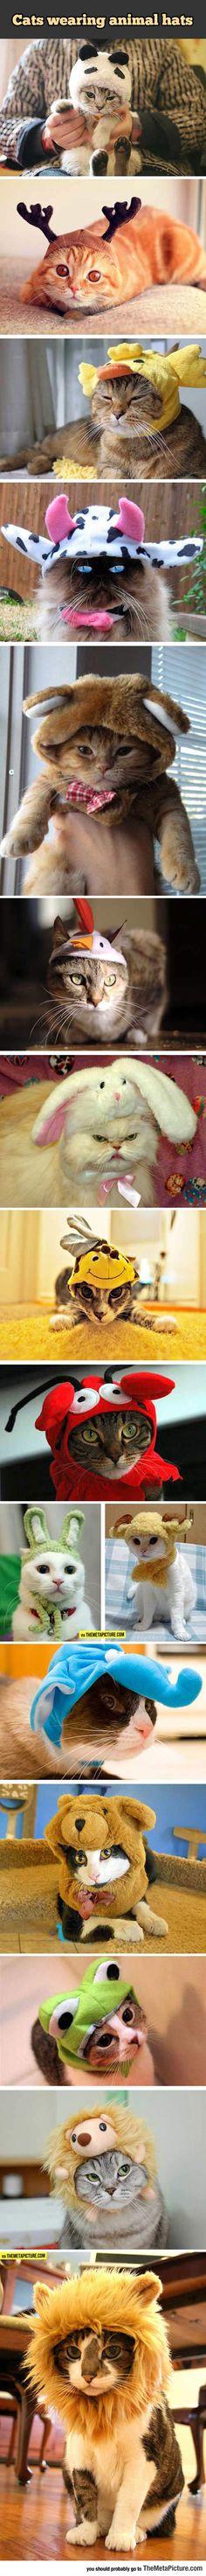 Felines Wearing Animal Hats